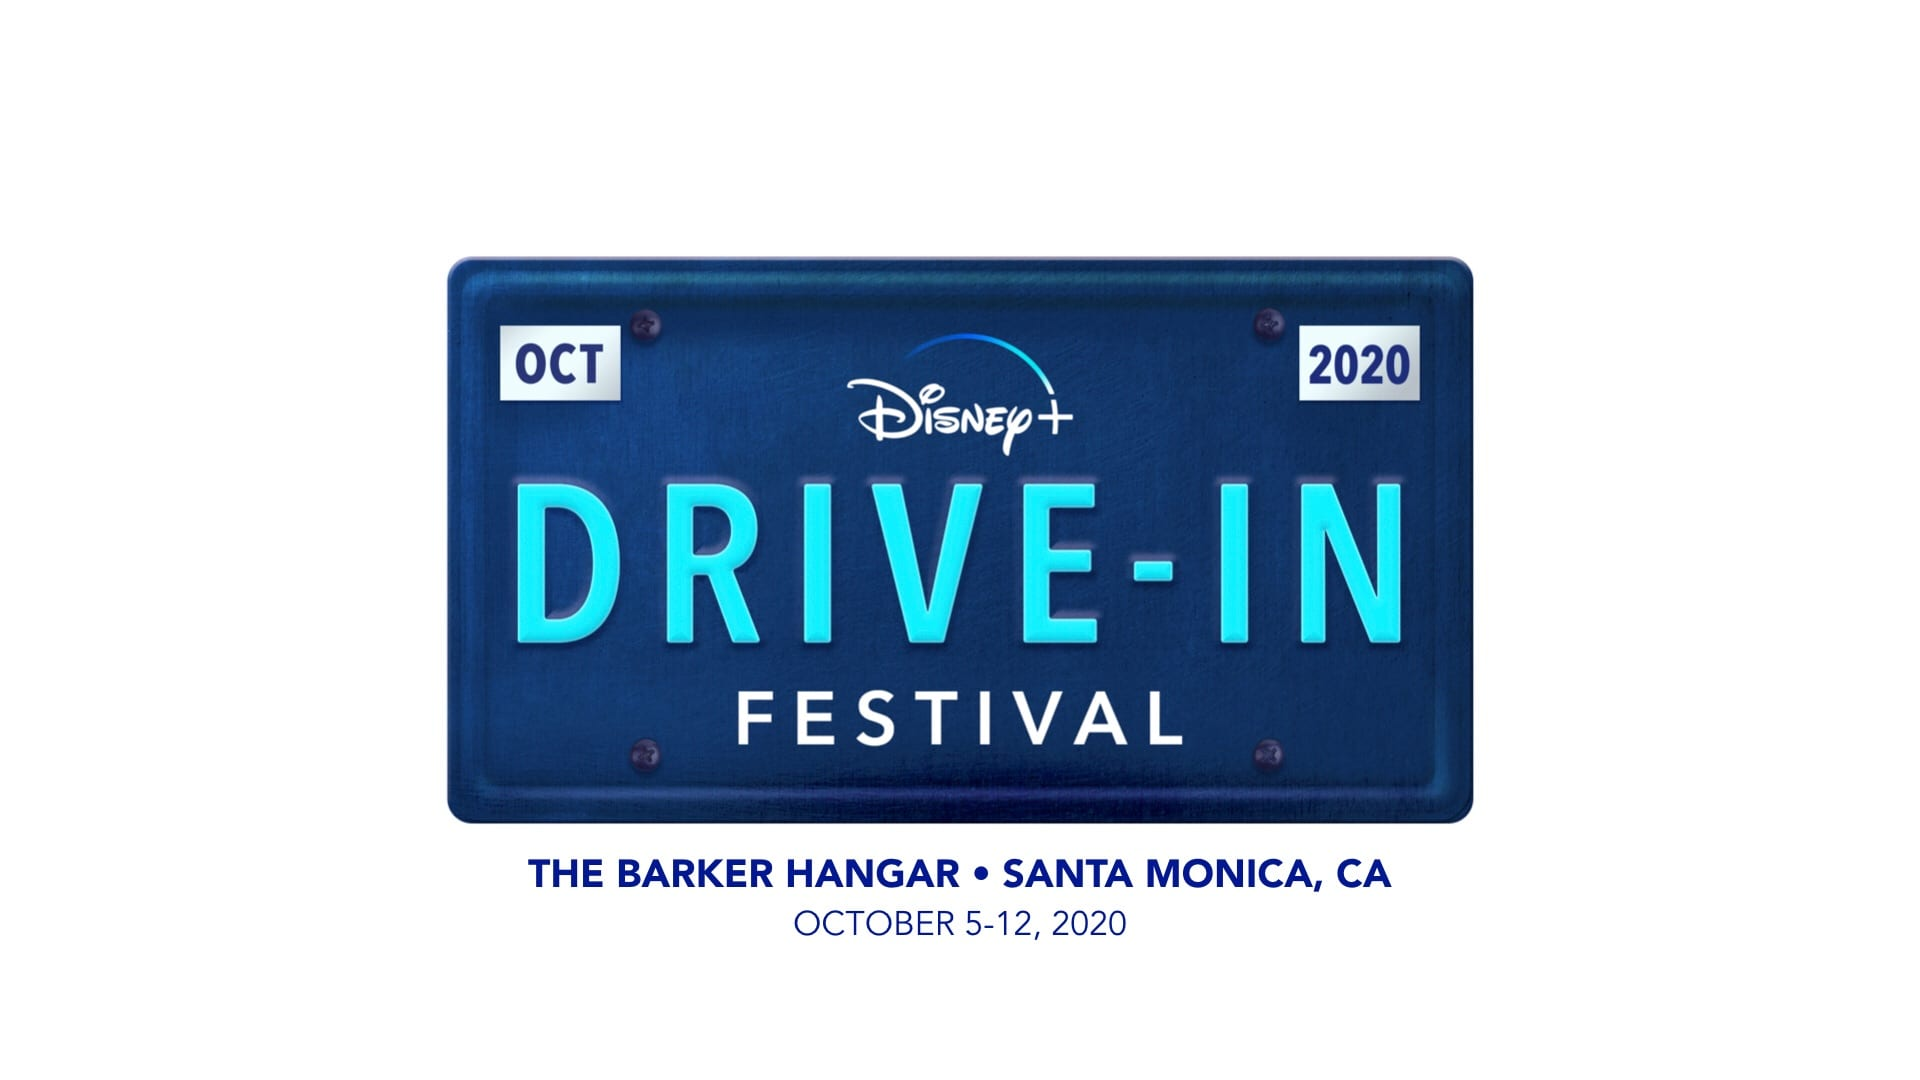 Disney+ Drive In Festival Disney Plus